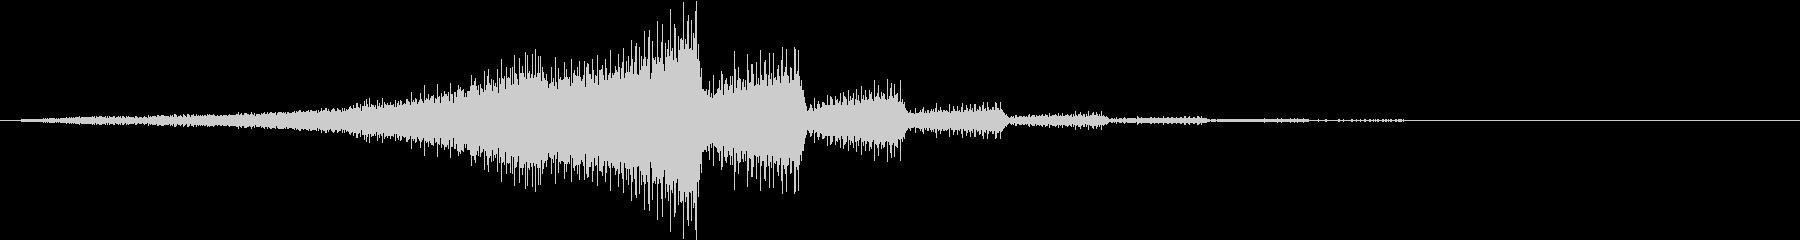 LOGO 企業向け CM サウンドロゴの未再生の波形